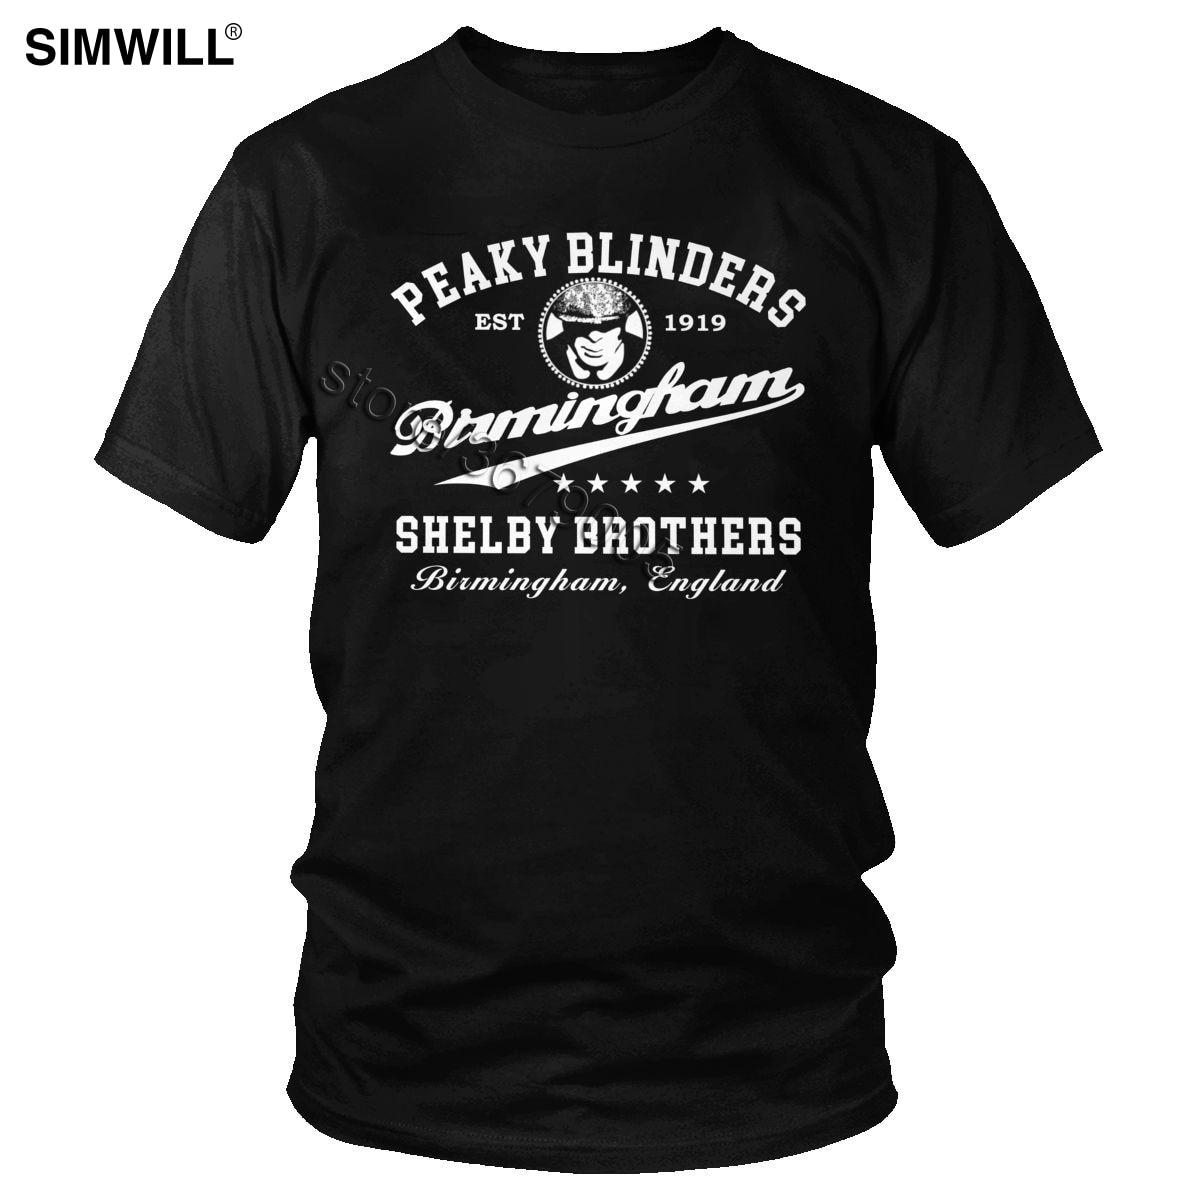 Vintage peaky blinders t camisa dos homens de algodão ventilador tv camiseta de manga curta streetwear tommy shelby t merch presente roupas birmingham